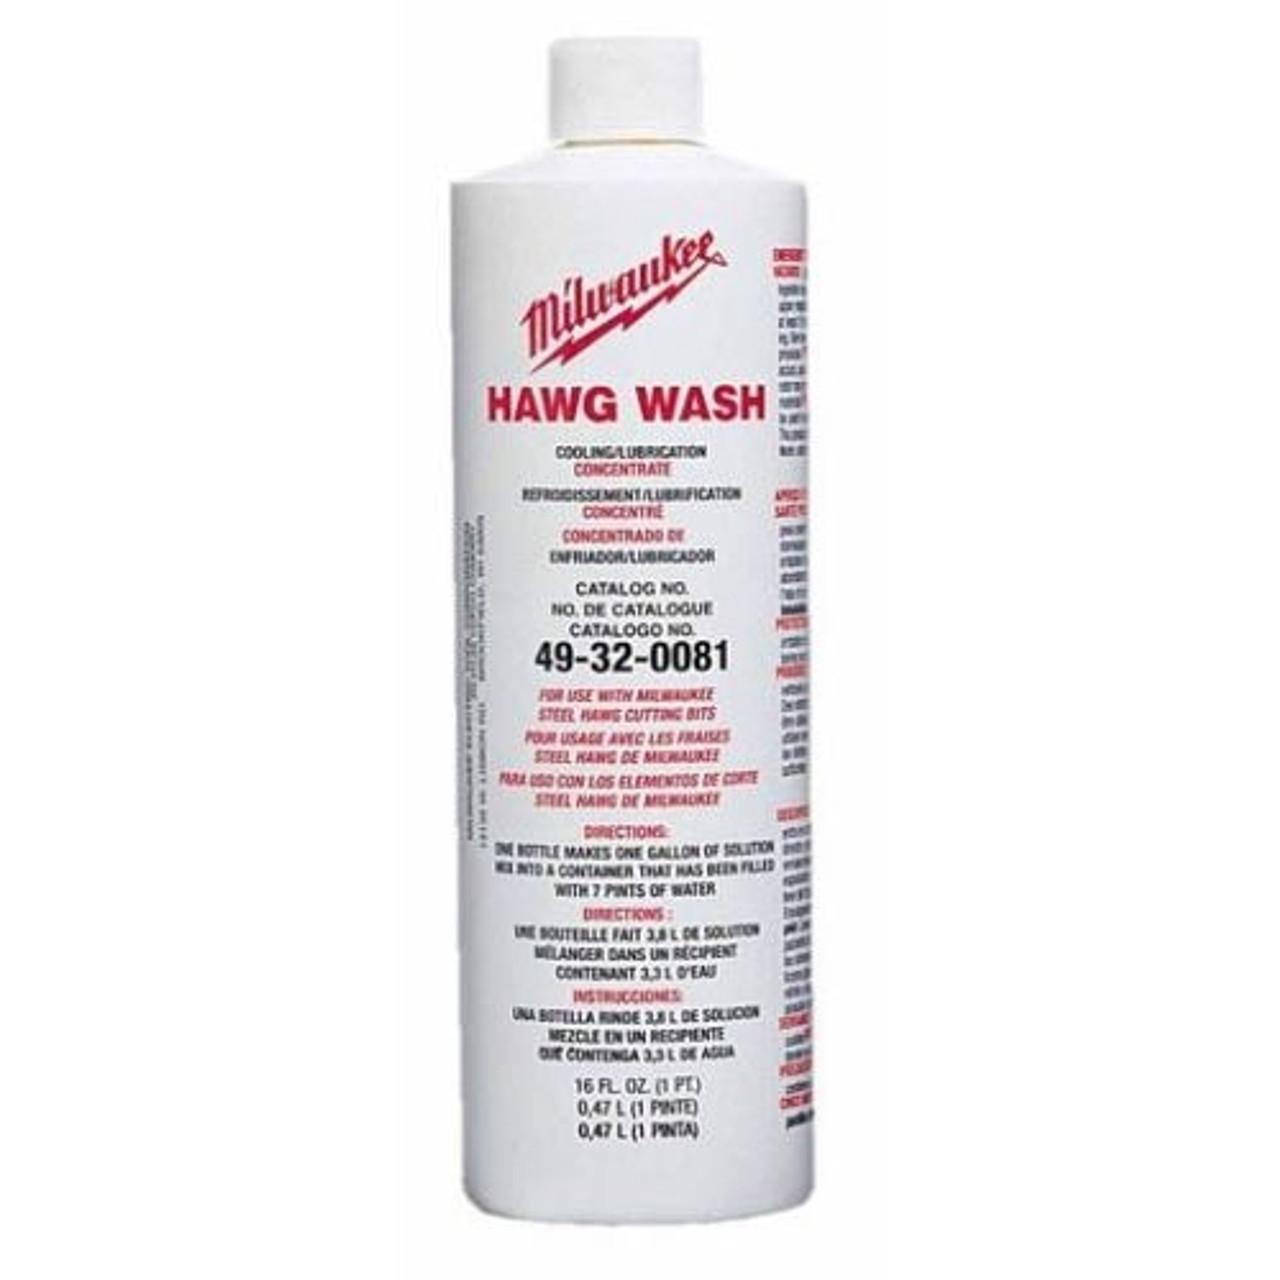 Milwaukee 49-32-0081 Hawg Wash 16 Ounce